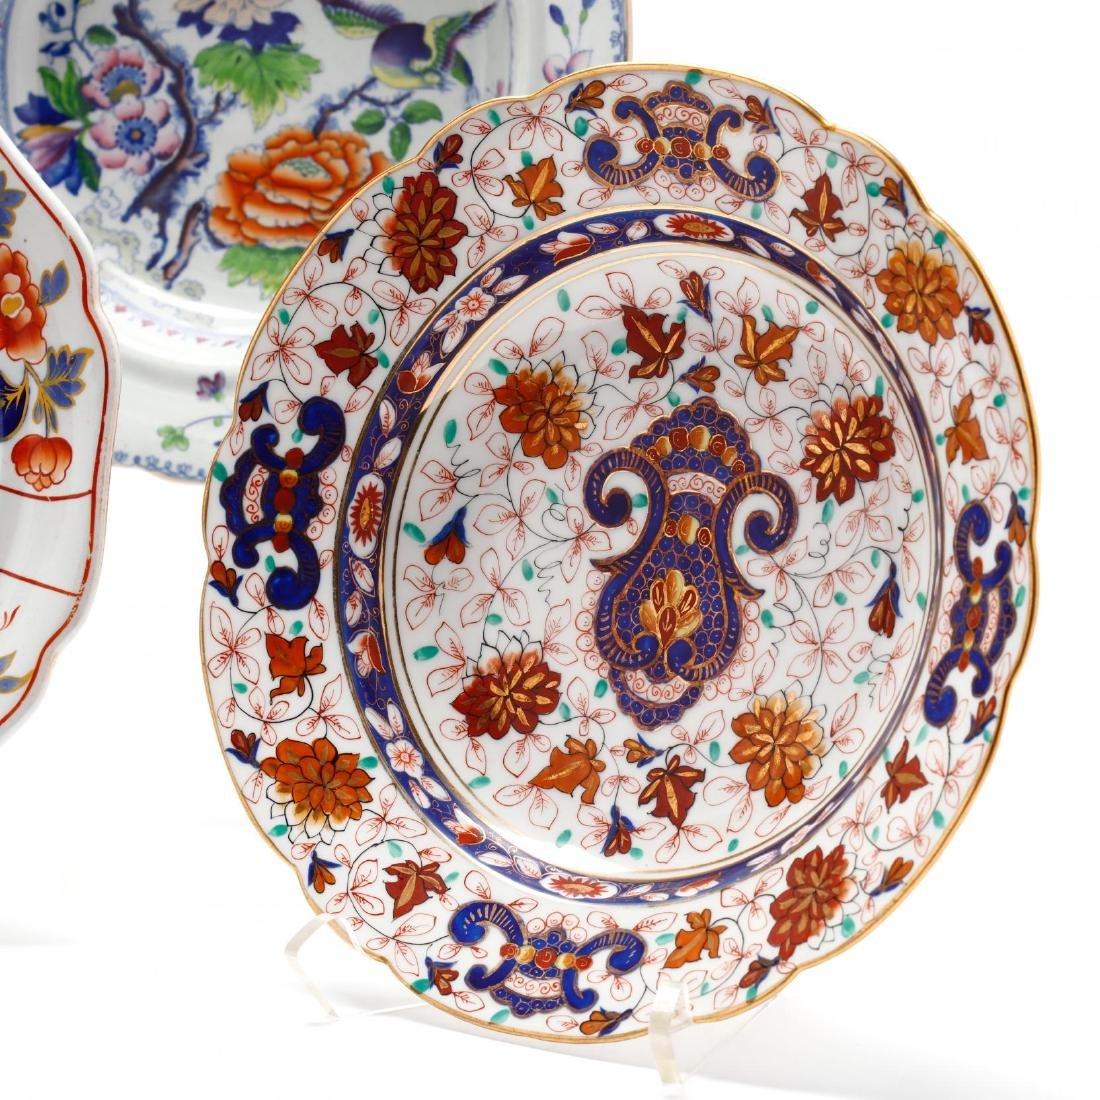 A Collection of Antique Soup Bowls - 7